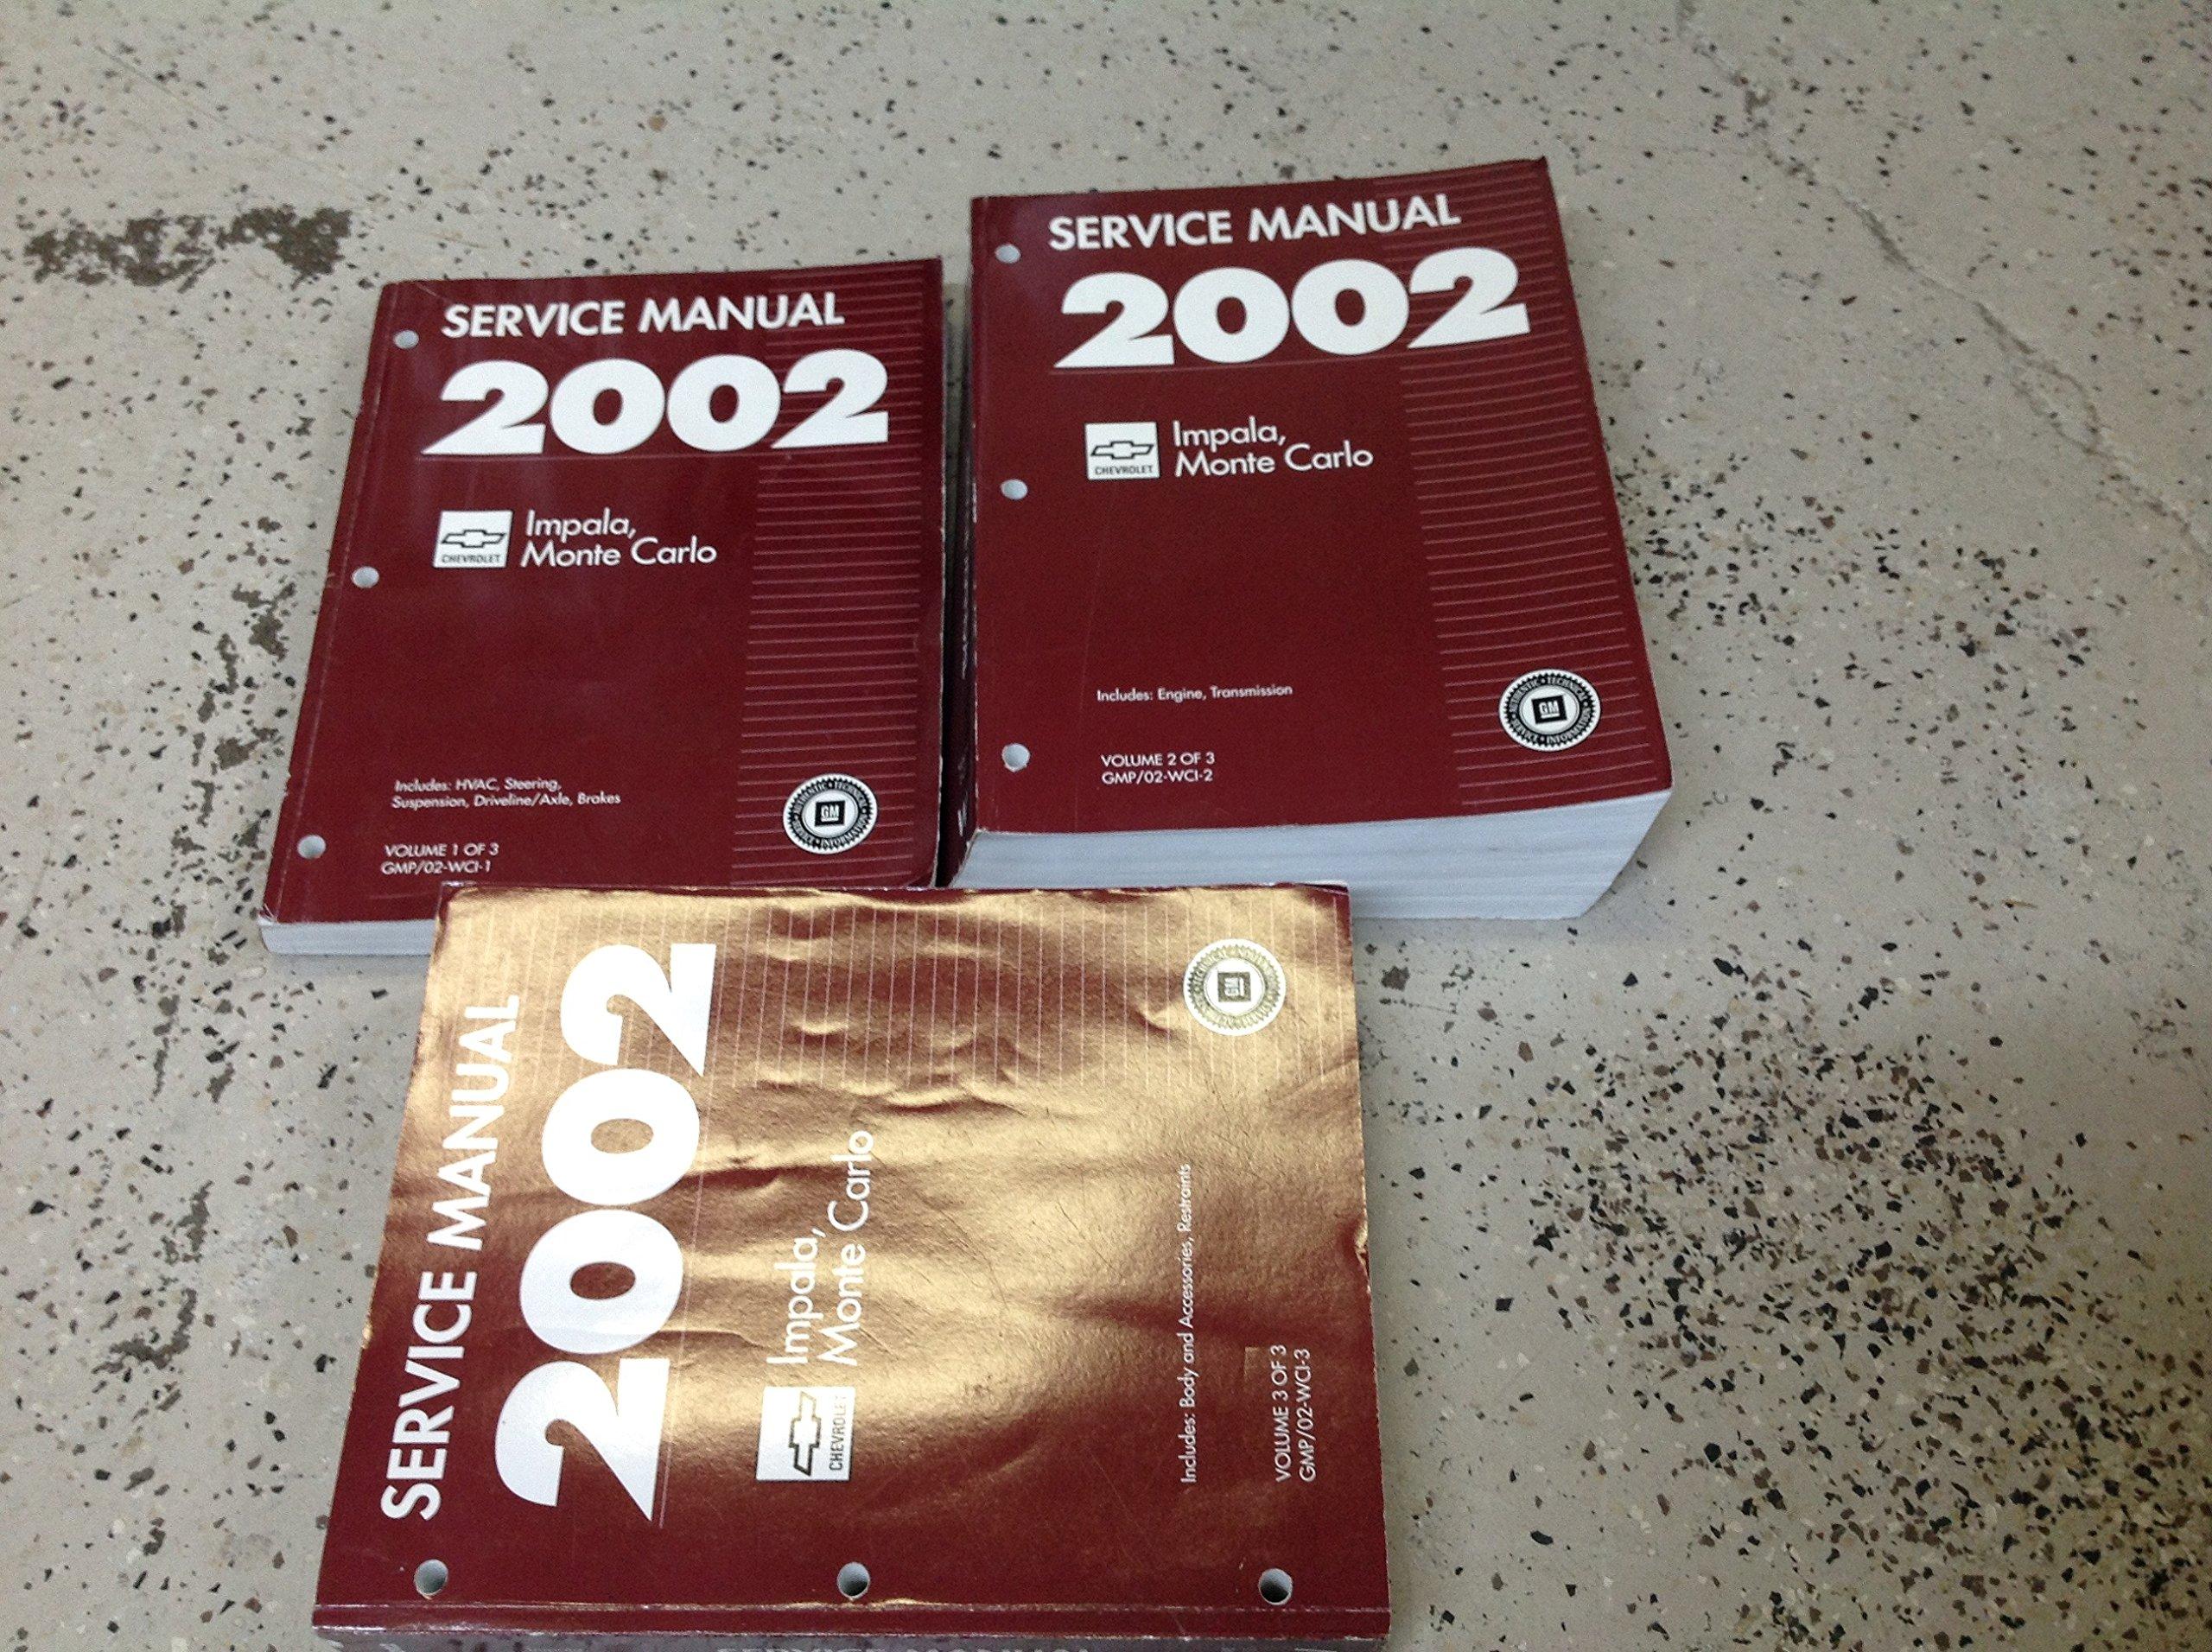 2002 chevy chevrolet impala monte carlo service manual 3 volume set rh amazon com User Manual PDF 2002 chevy impala service manual